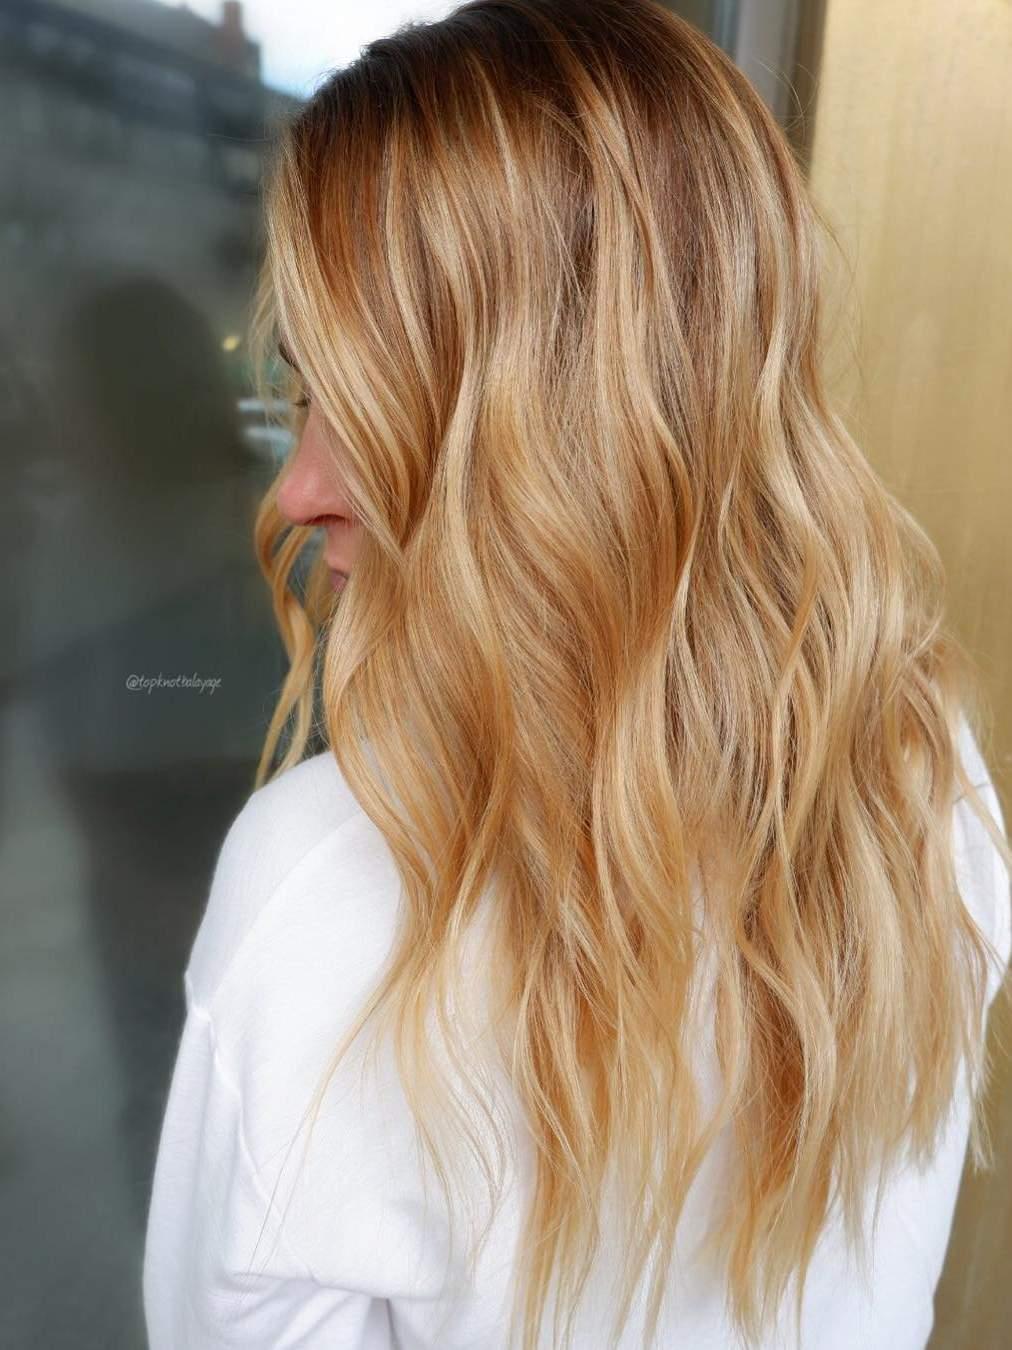 Strawberry honey για να κερδίσετε τις εντυπώσεις με το κορυφαίο trend στο χρώμα μαλλιών για το 2019